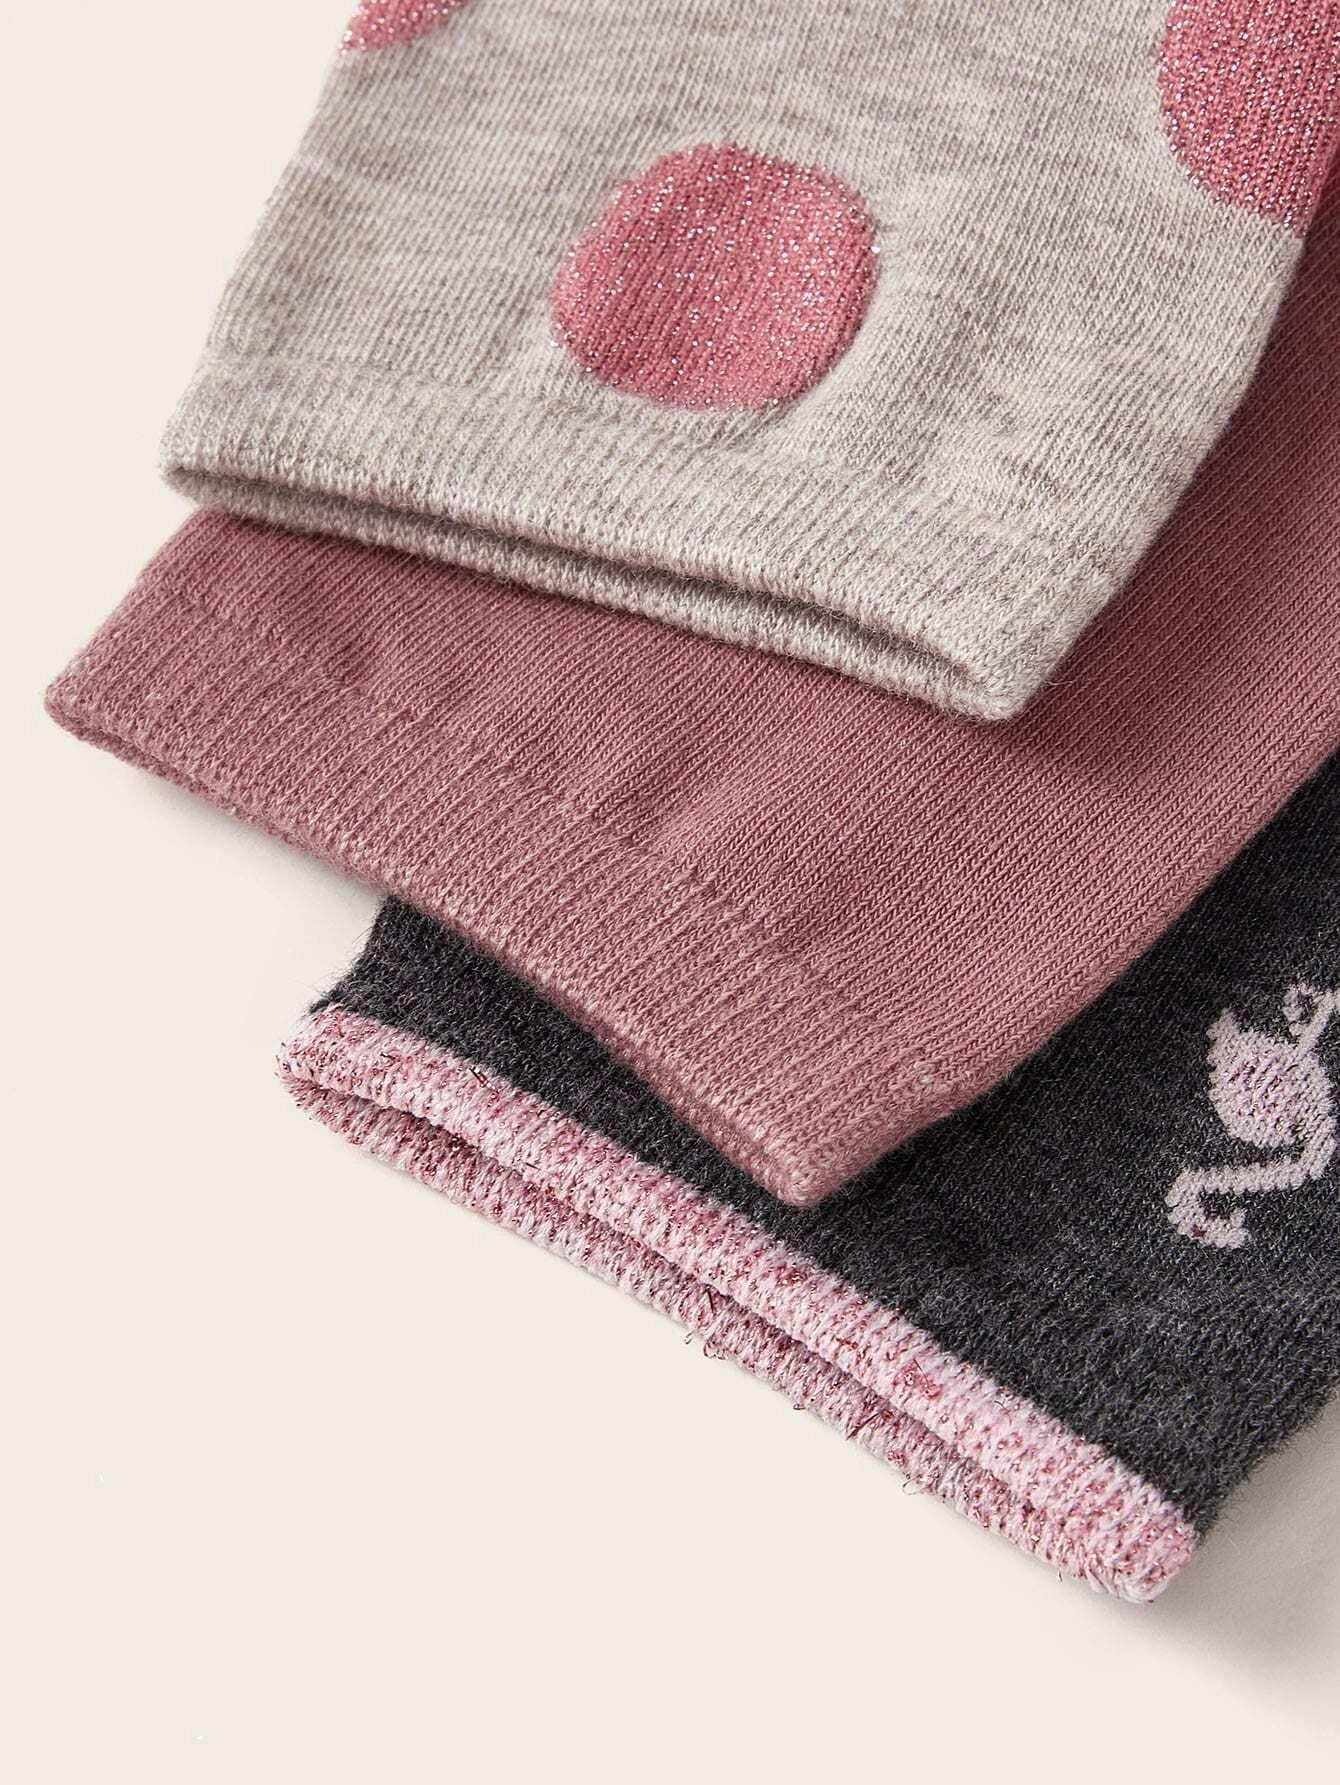 Gold Flamingo Set Womens Socks 3 Pairs NHPIN366427